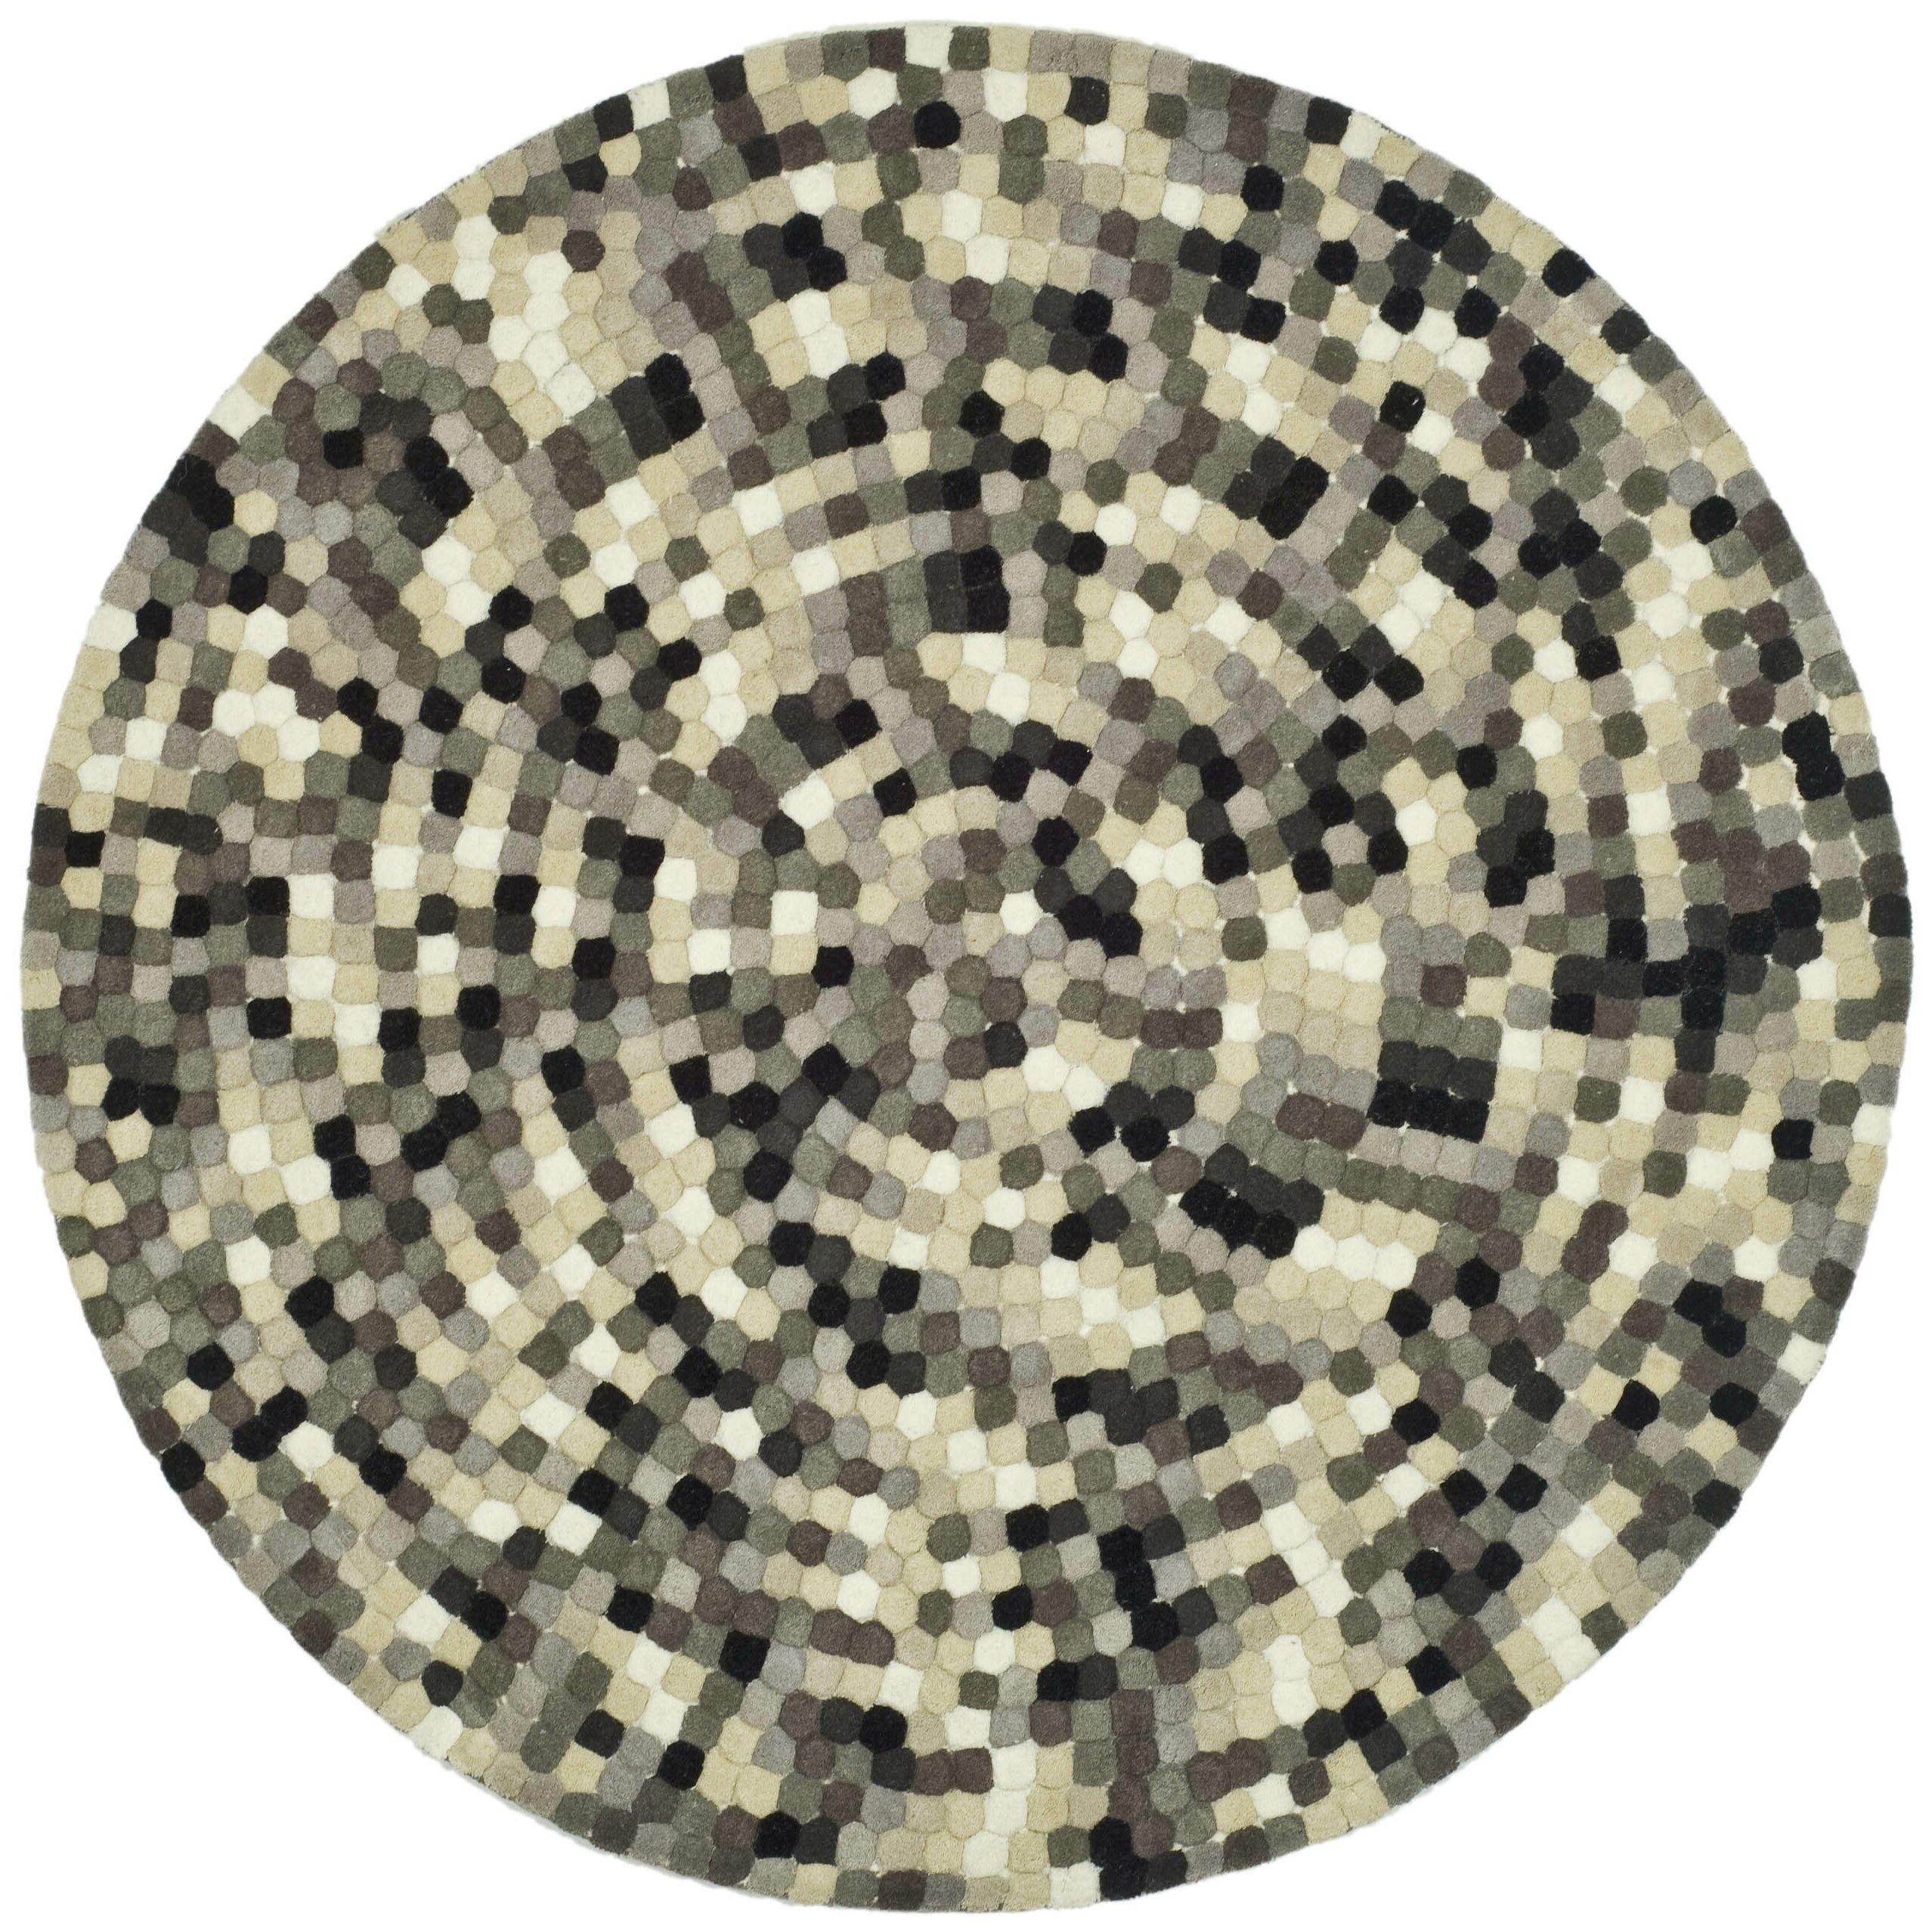 safavieh soho black grey area rug reviews wayfair. Black Bedroom Furniture Sets. Home Design Ideas